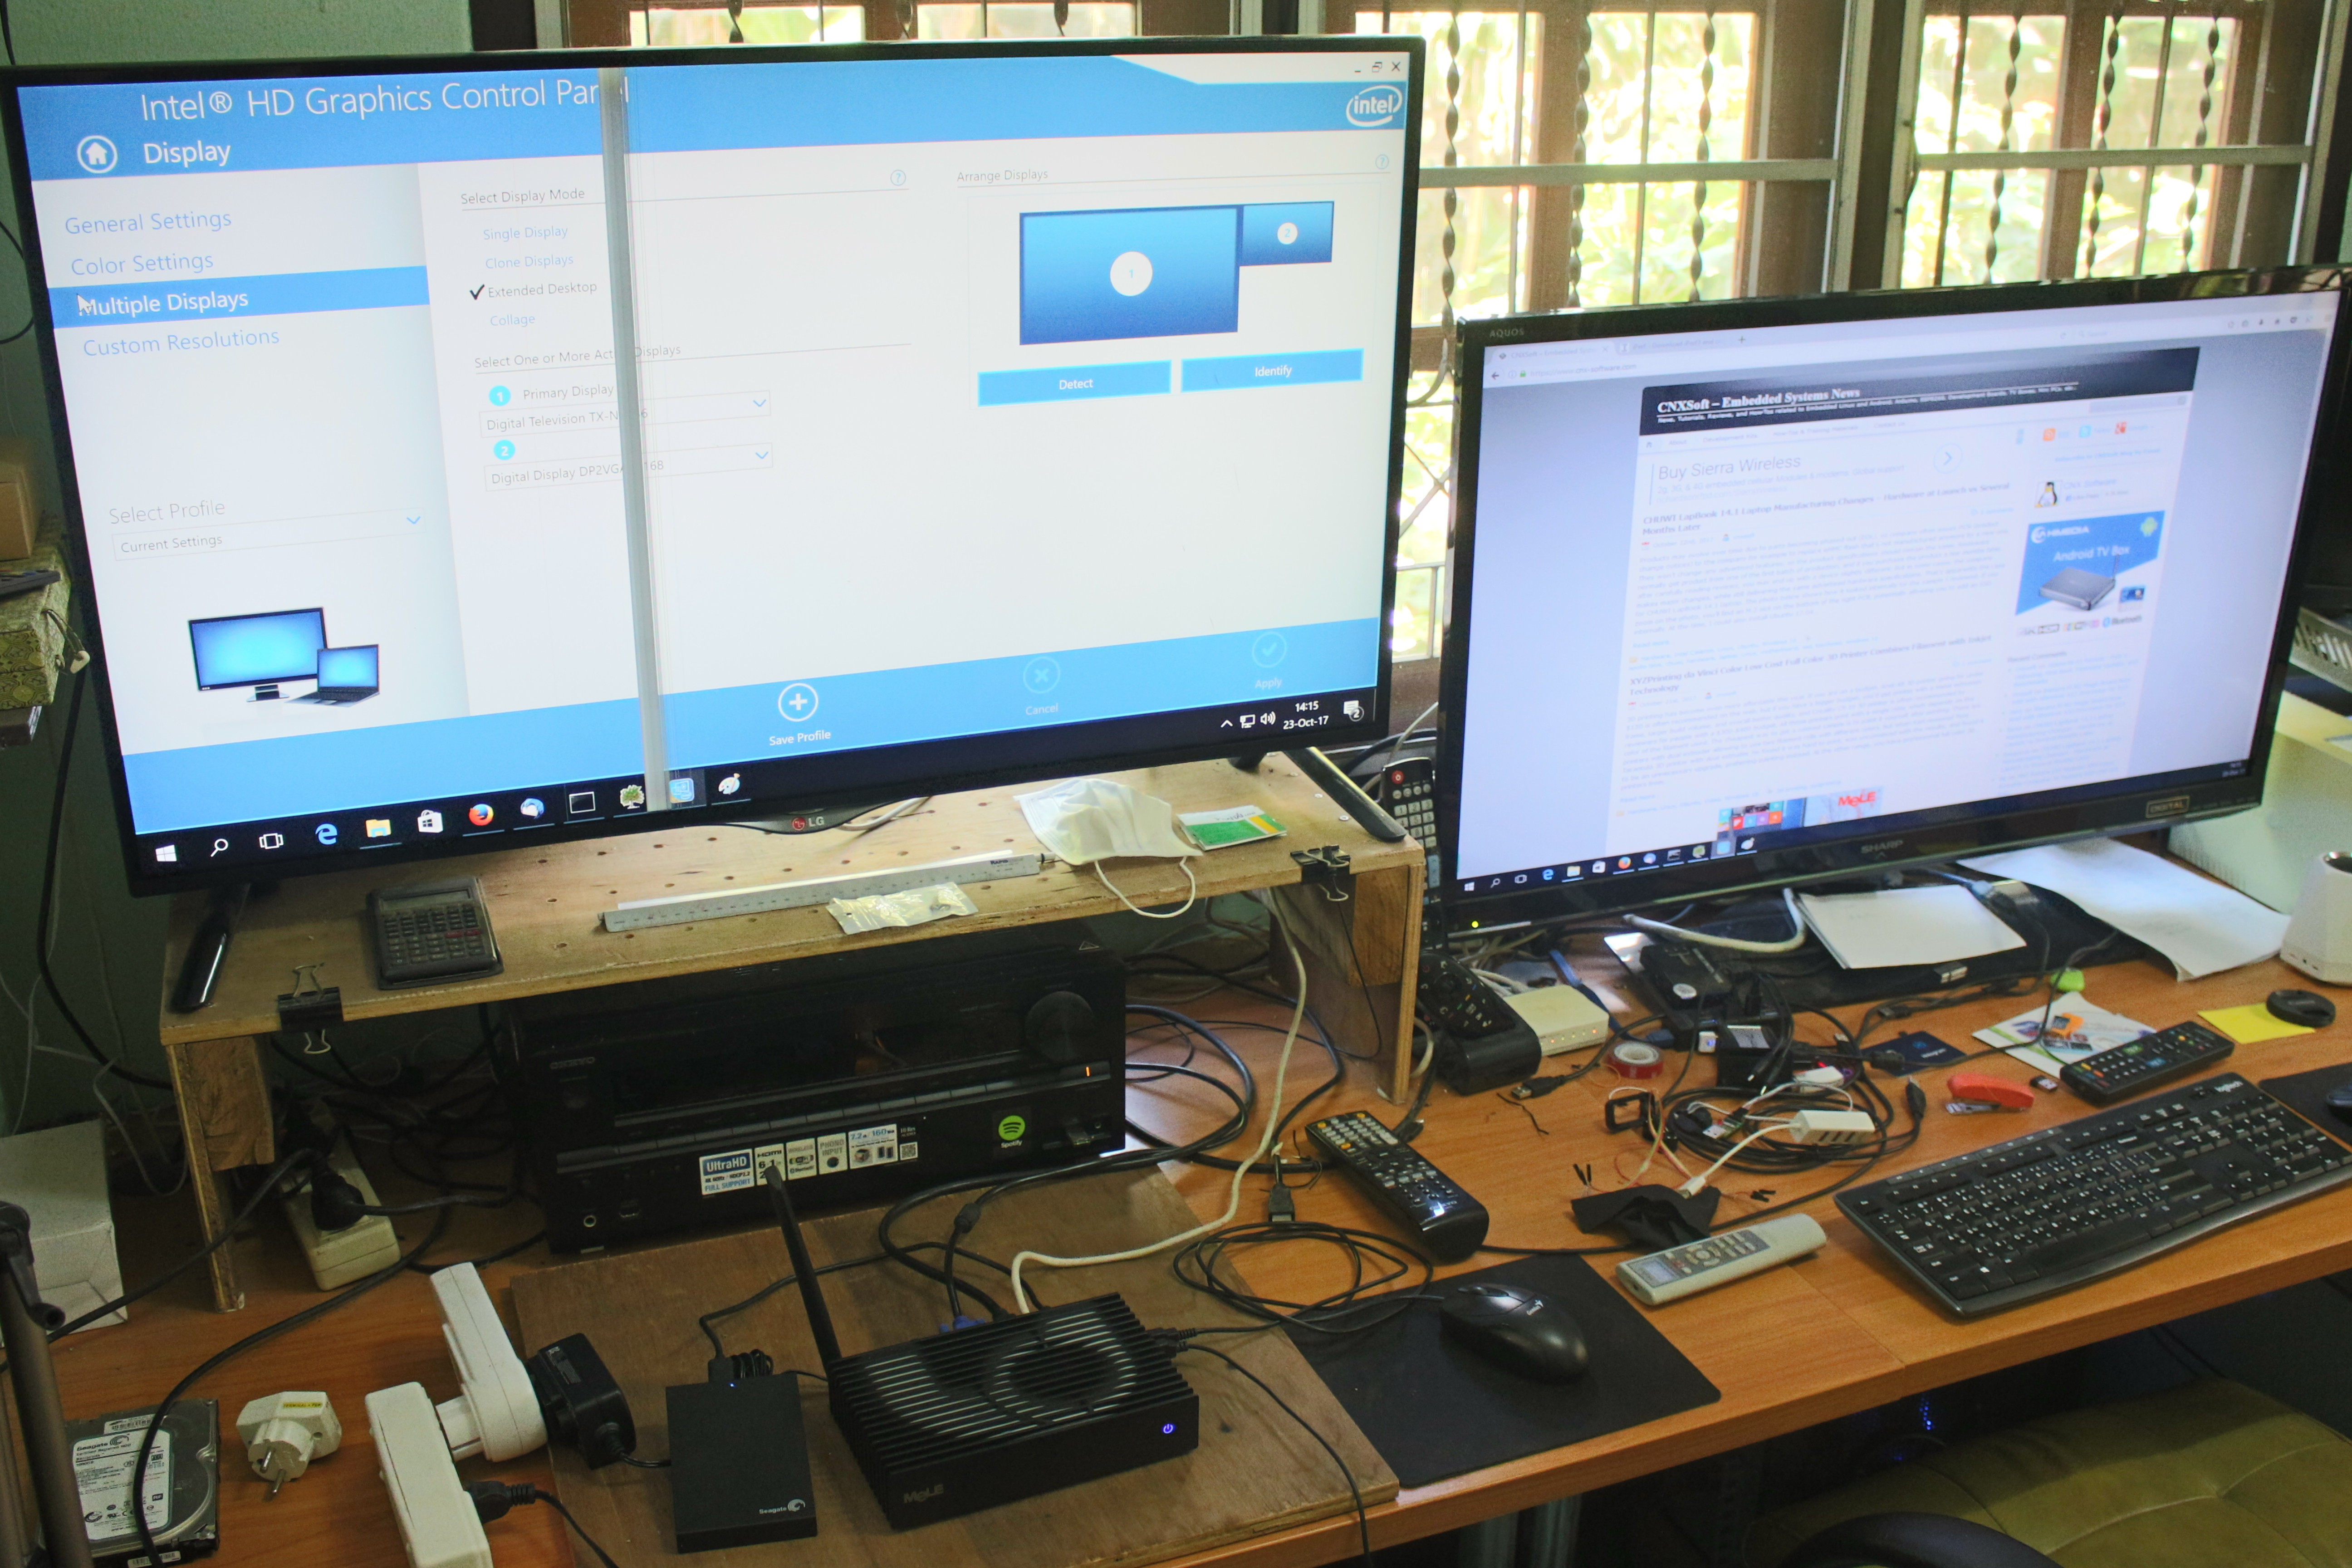 MeLE PCG35 Apo Mini PC Review - Part 2: Windows 10 Home